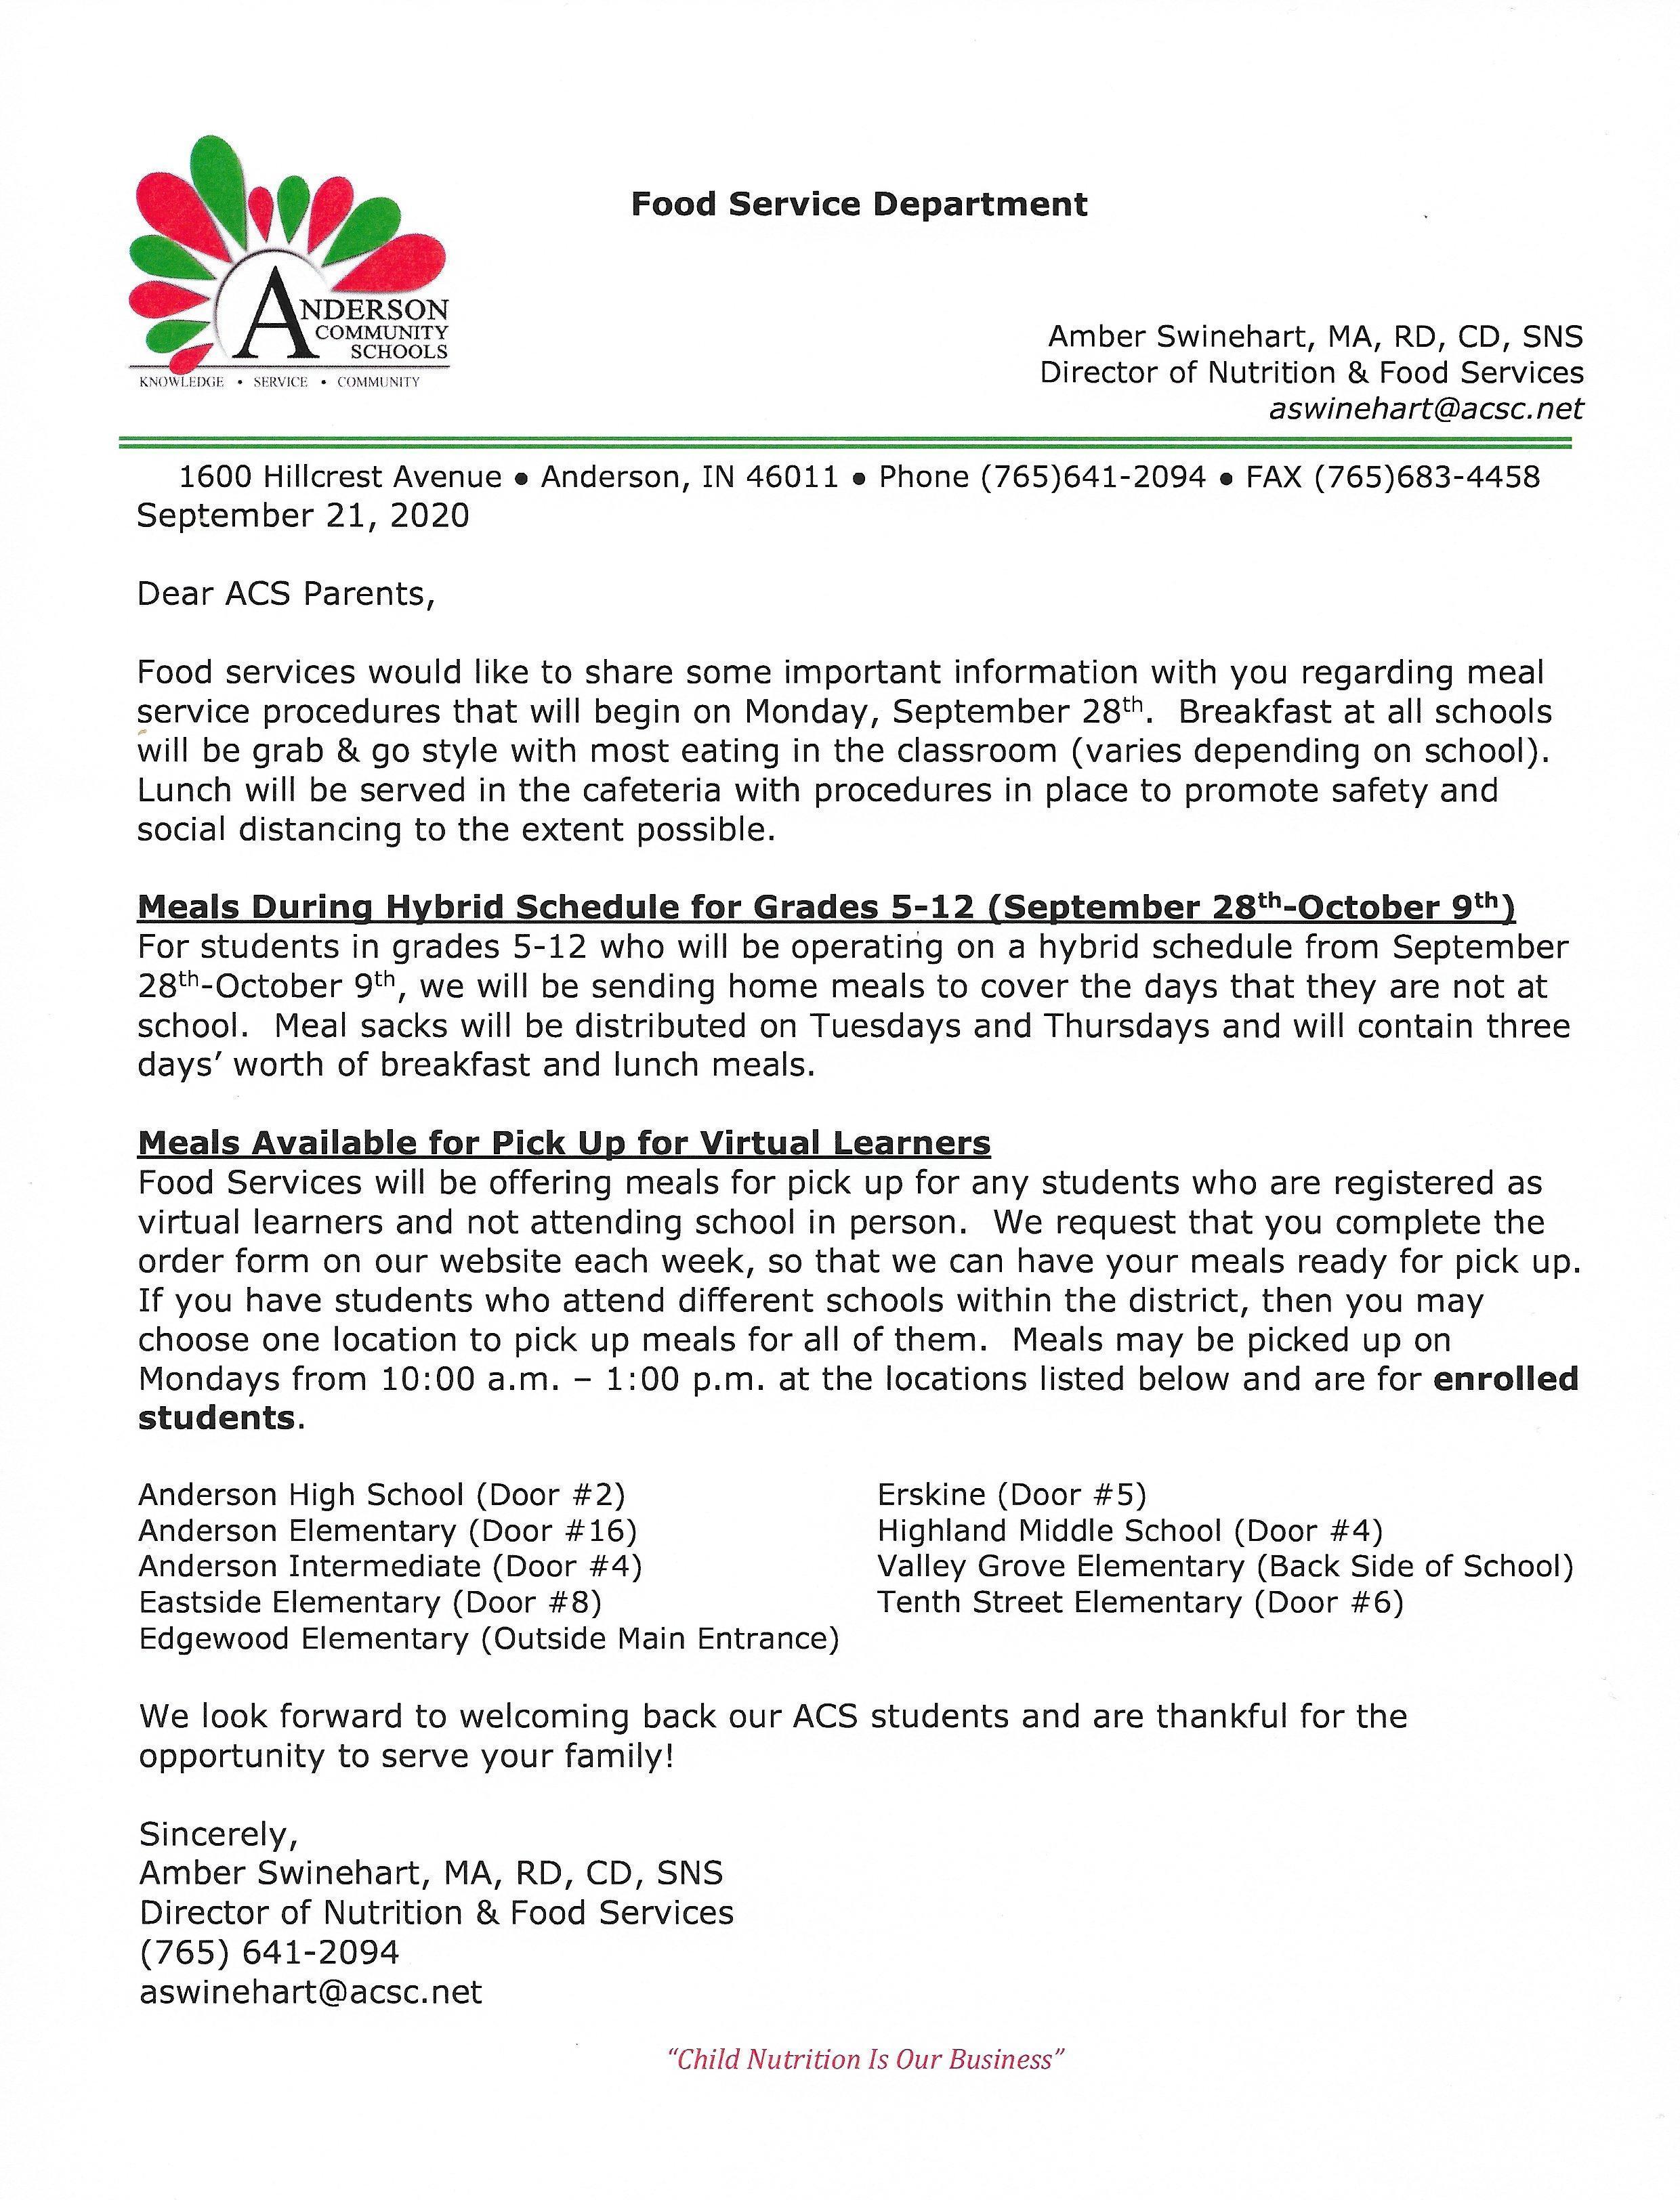 Food Services Letter